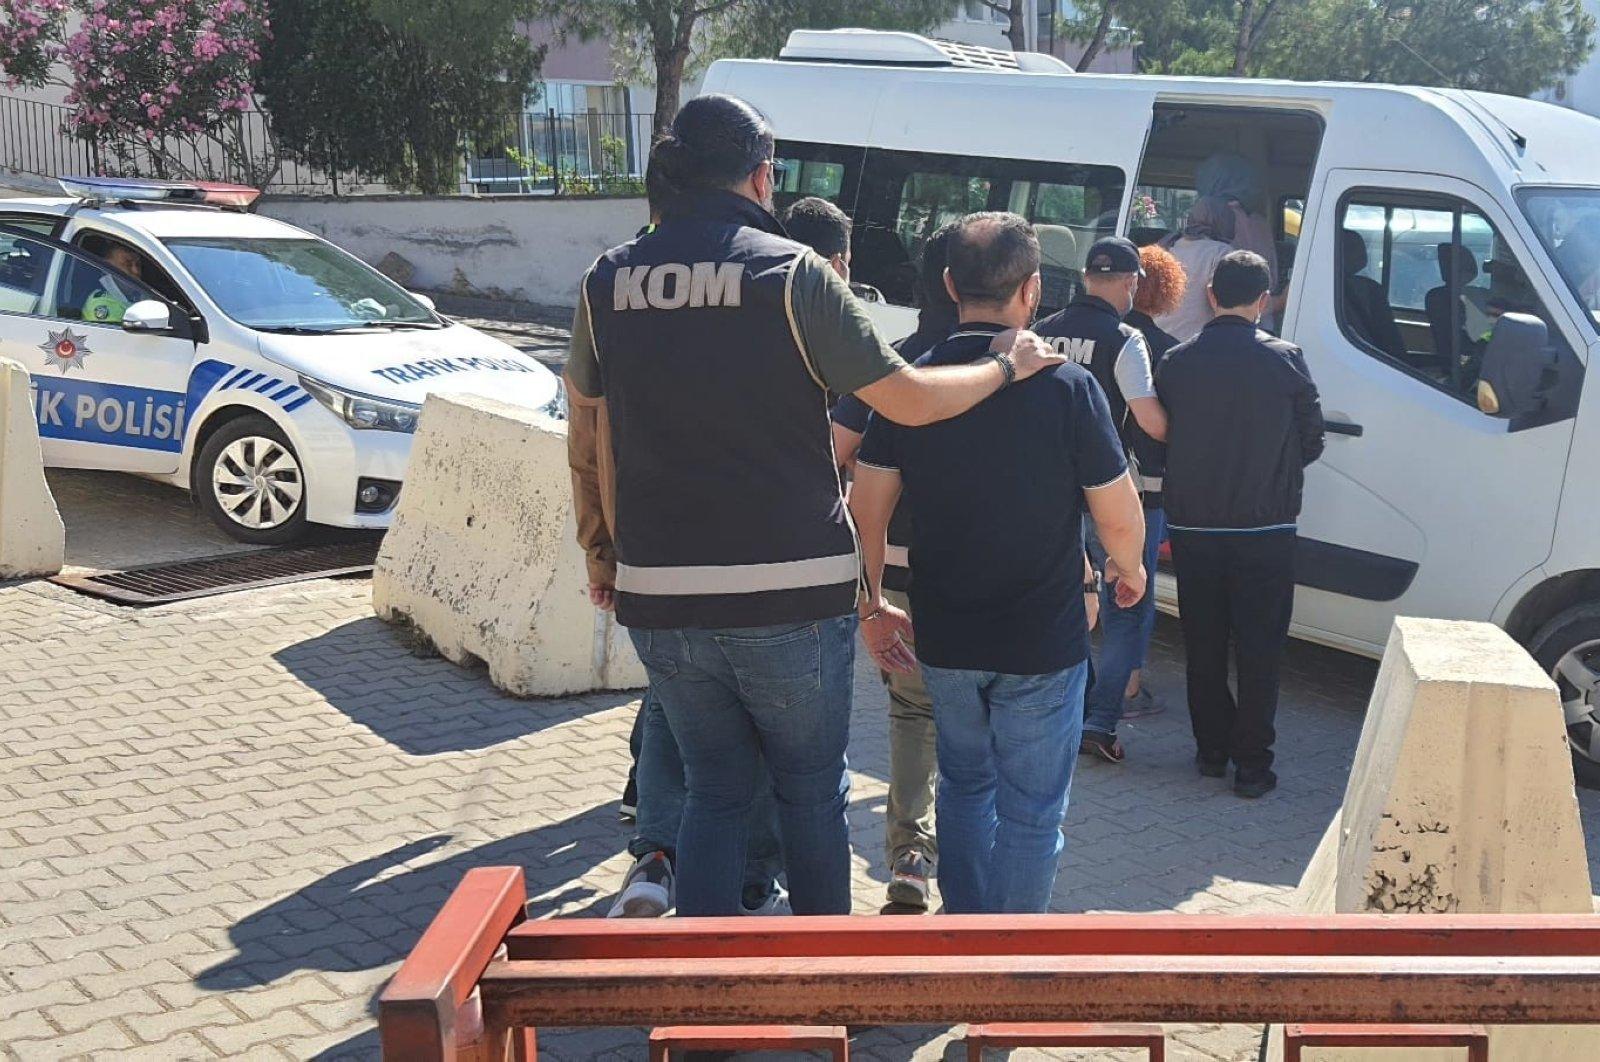 Police escort captured suspects to a van in Ayvalık, Balıkesir, northwestern Turkey, June 18, 2021. (İHA PHOTO)